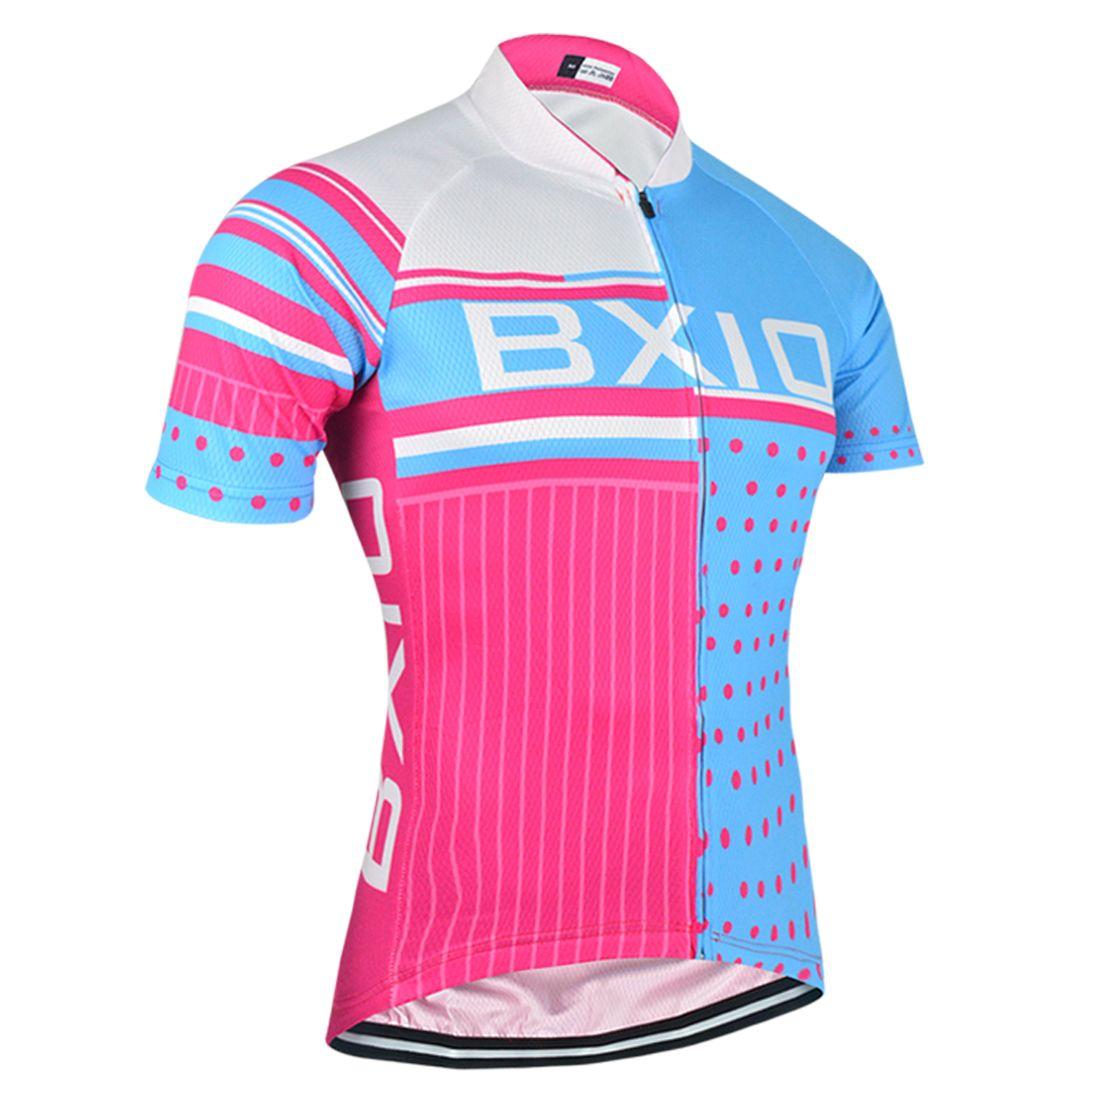 BXIO Brand Cycling Tops Cycle Clothing Women Pink Floyd Fashion Sport Cycling  Jerseys Short Sleeve Summer Cool Bicycle Clothes BX 013 J Mens Shirts  Online ... ecdcb92f3